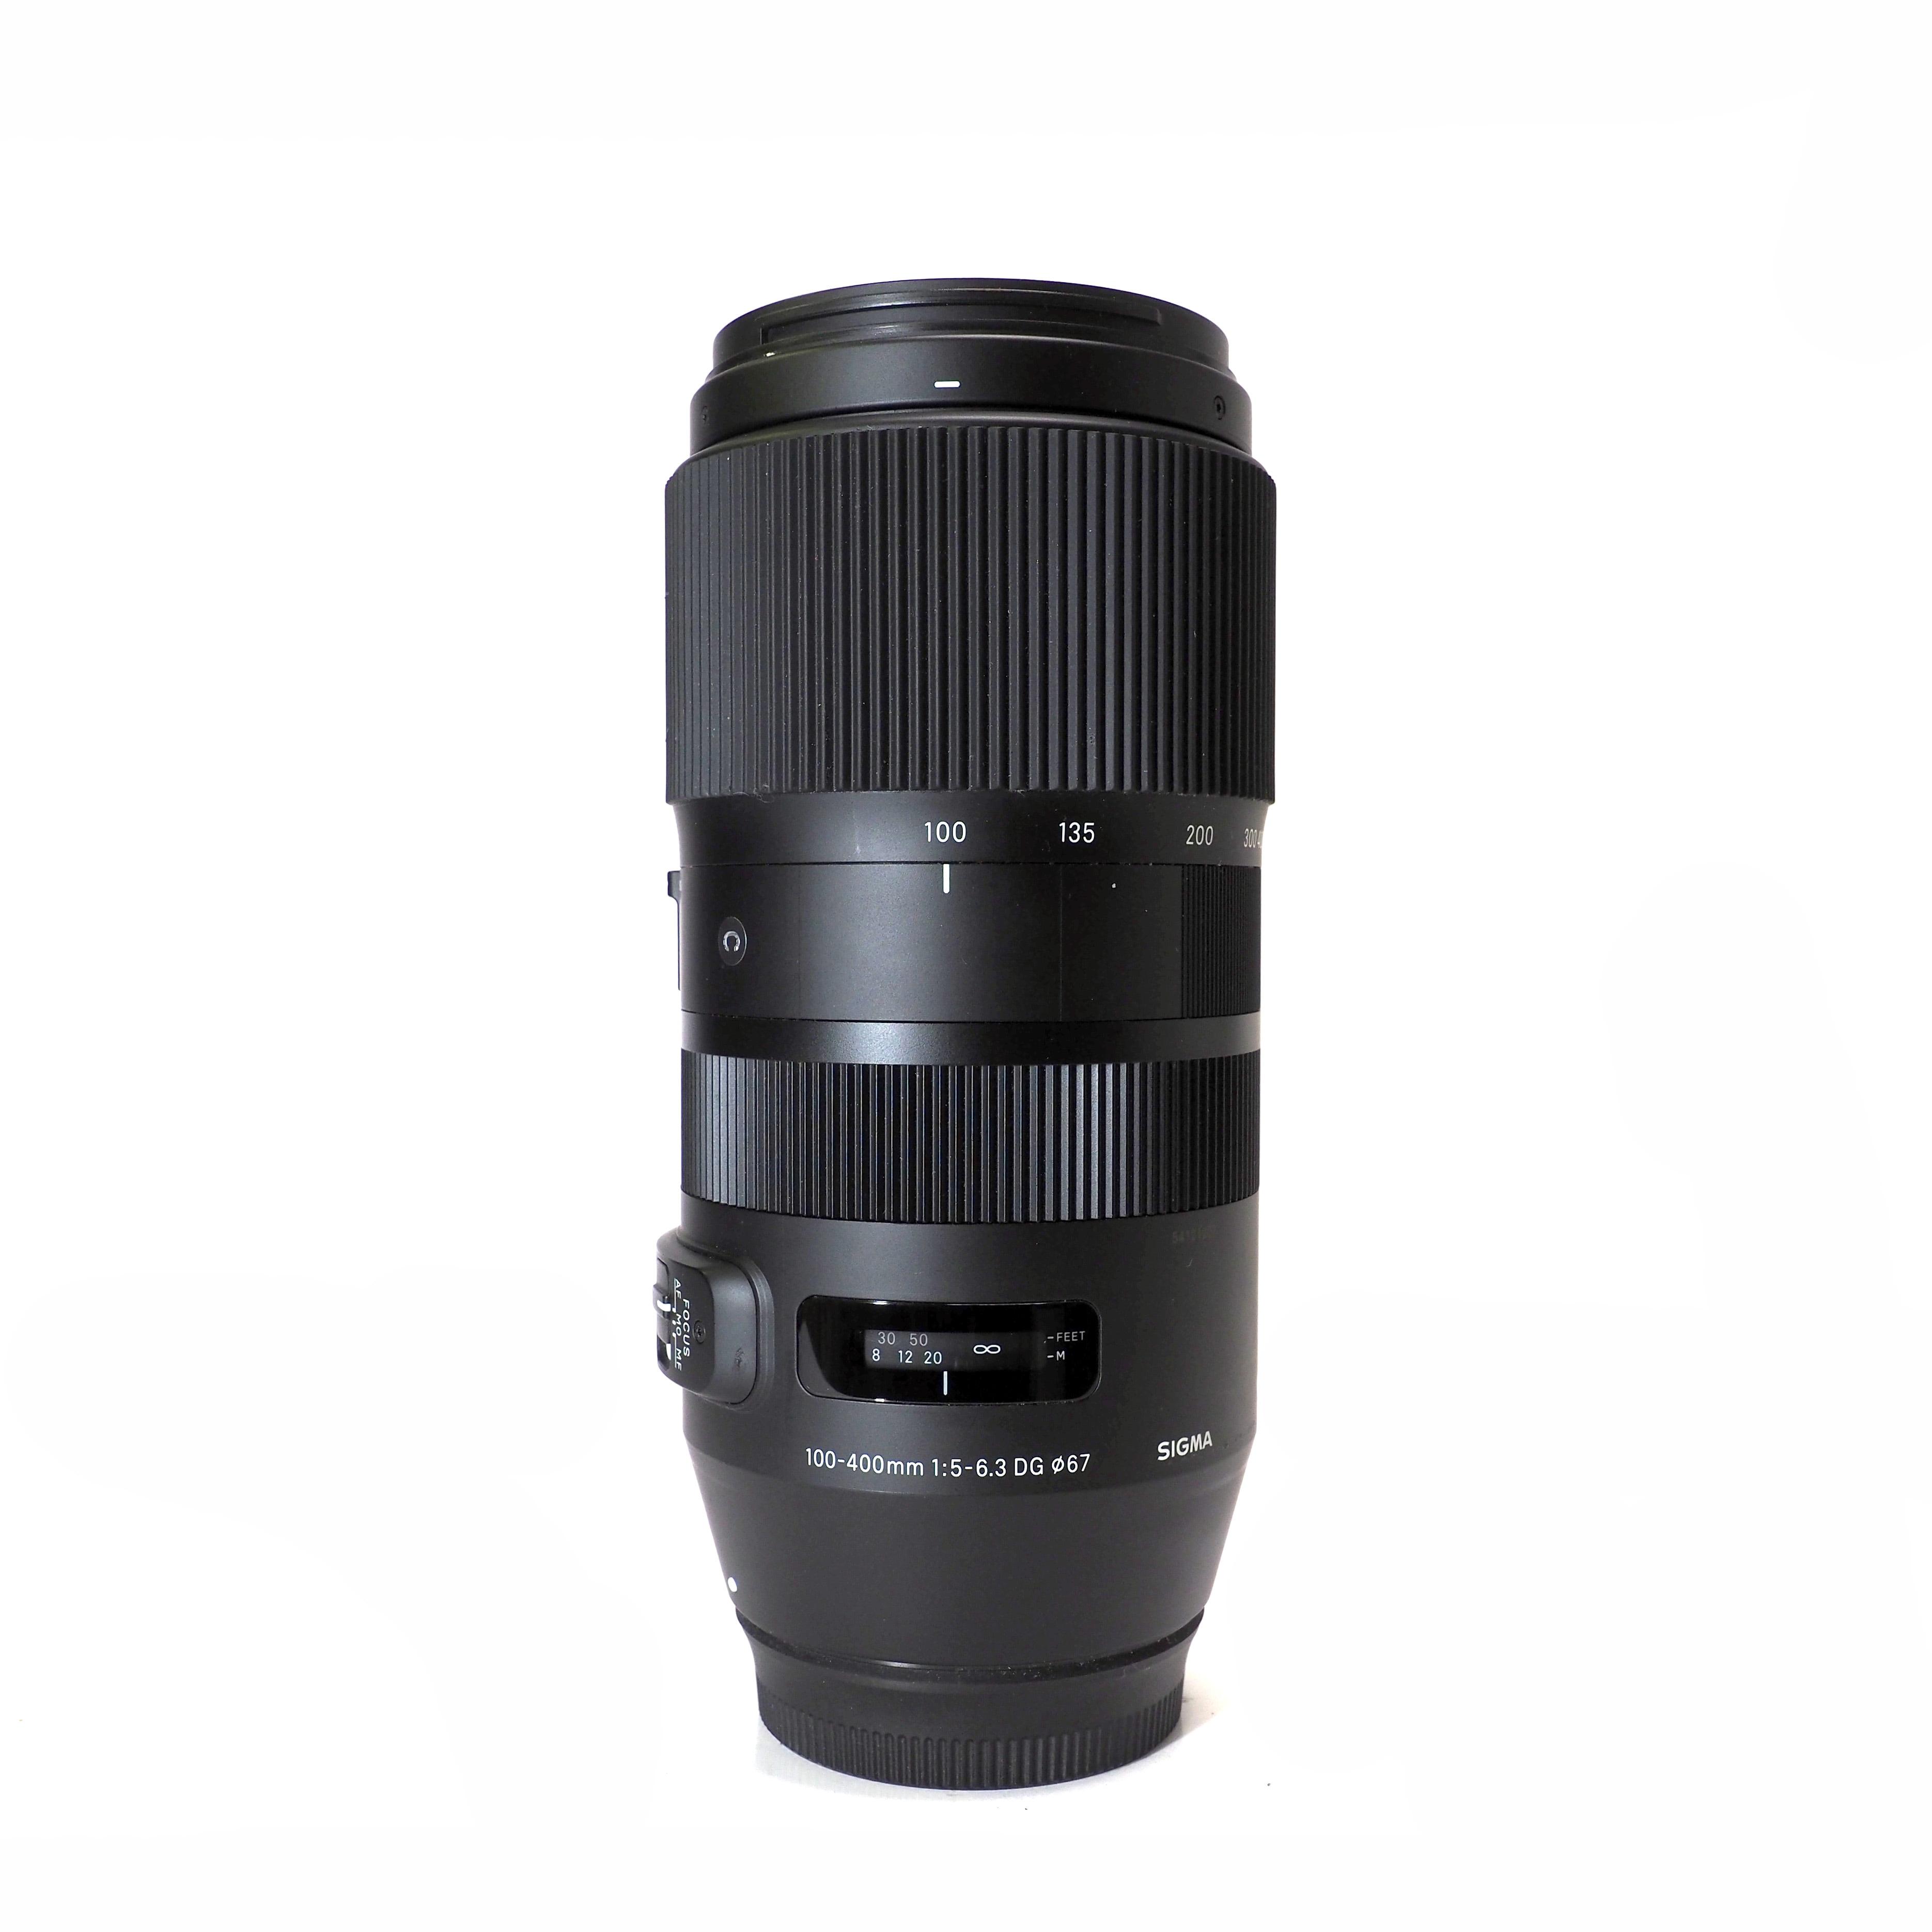 Sigma 100-400mm f/5-6.3 Contemporary för Canon- BEGAGNAT